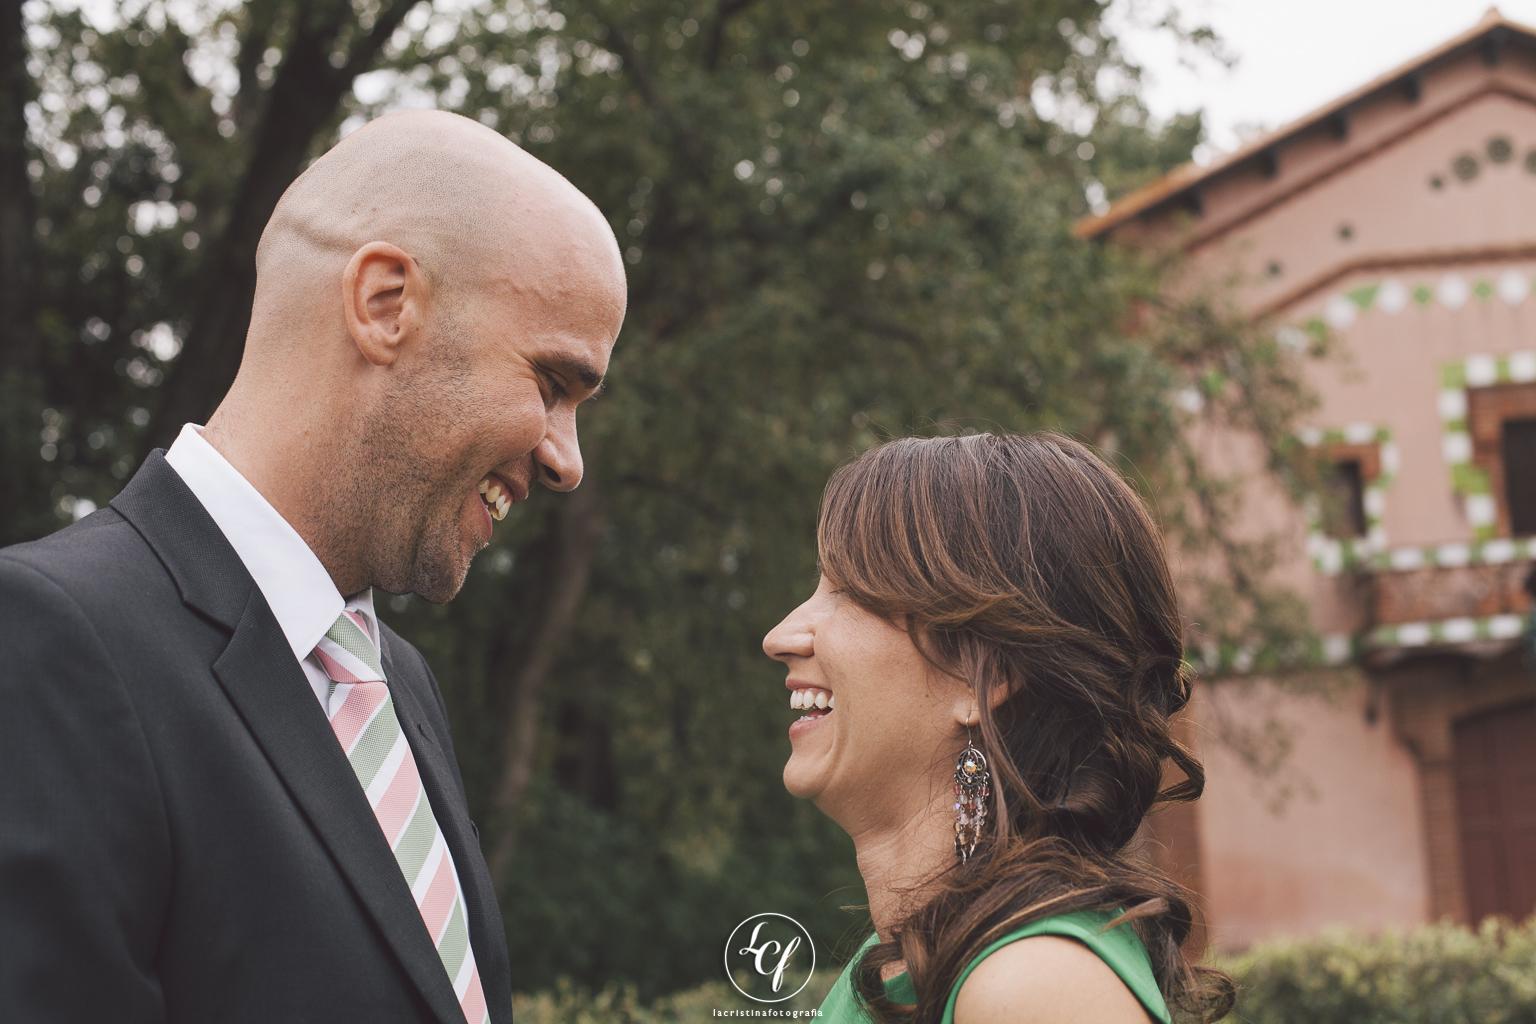 fotógrafo de boda :: fotógrafo de boda la roureda :: boda en el campo :: boda en una masía :: fotógrafo de boda badalona